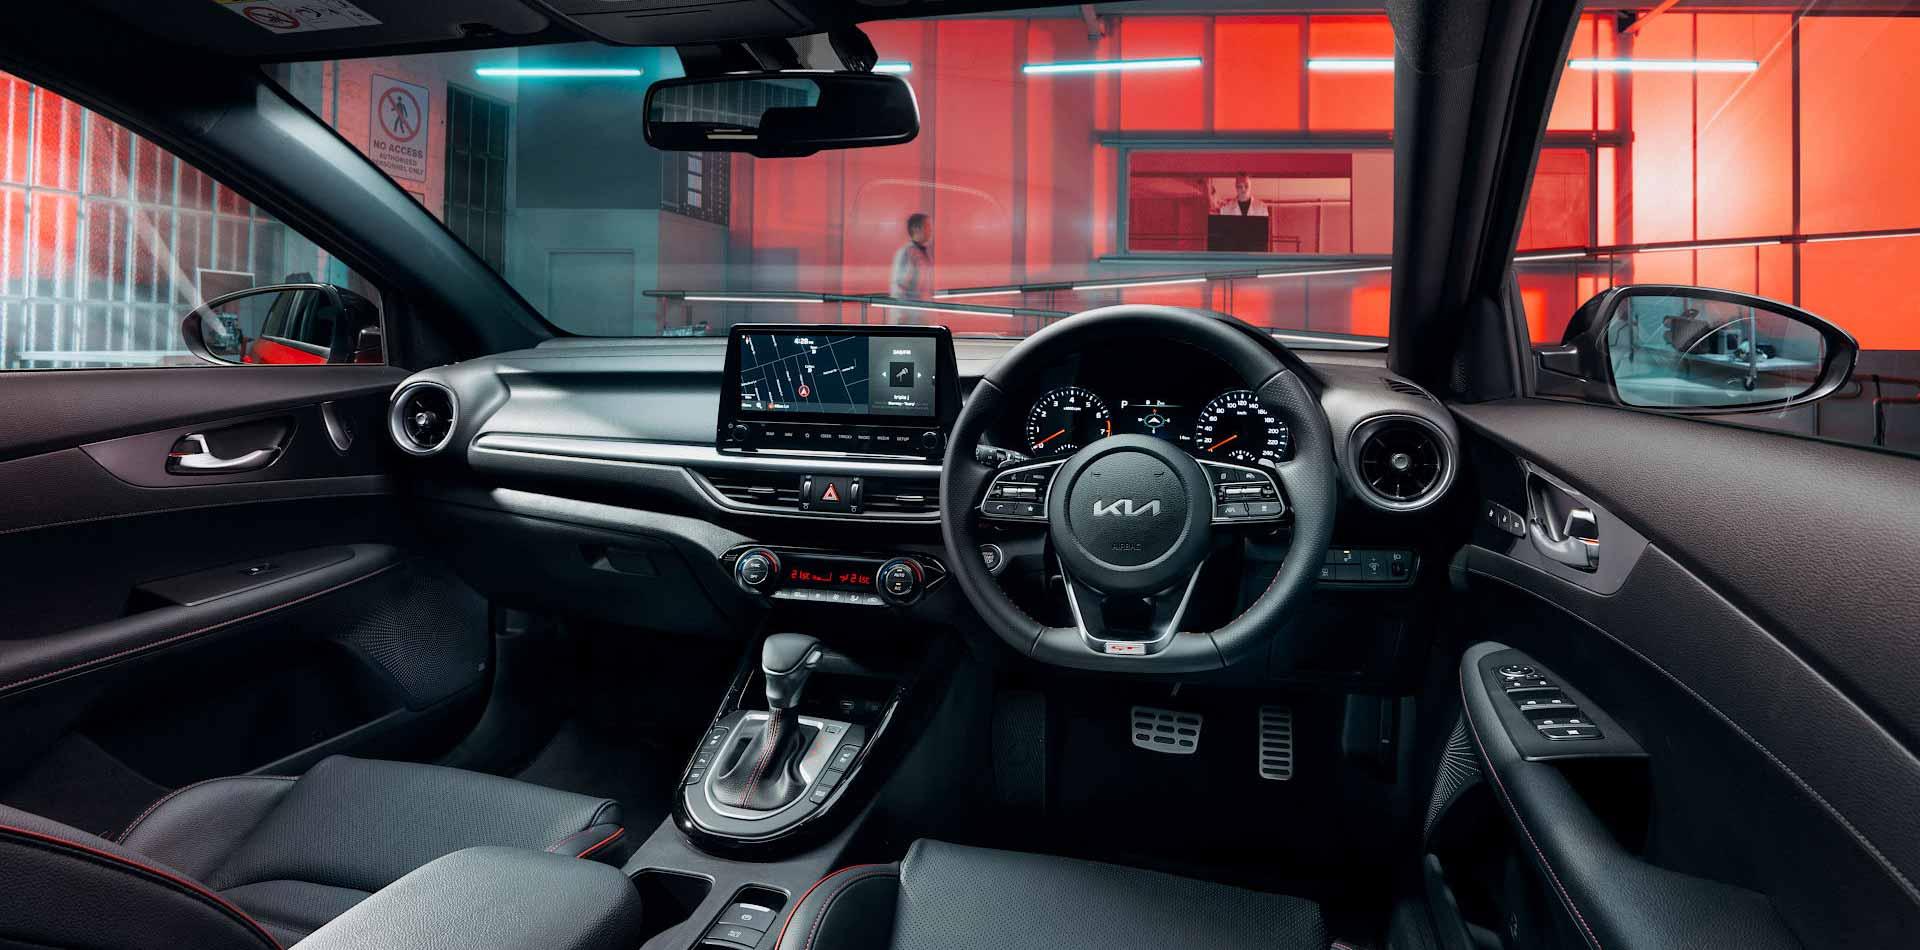 Kia-New-Cerato-Interior-Digitally-Remastered